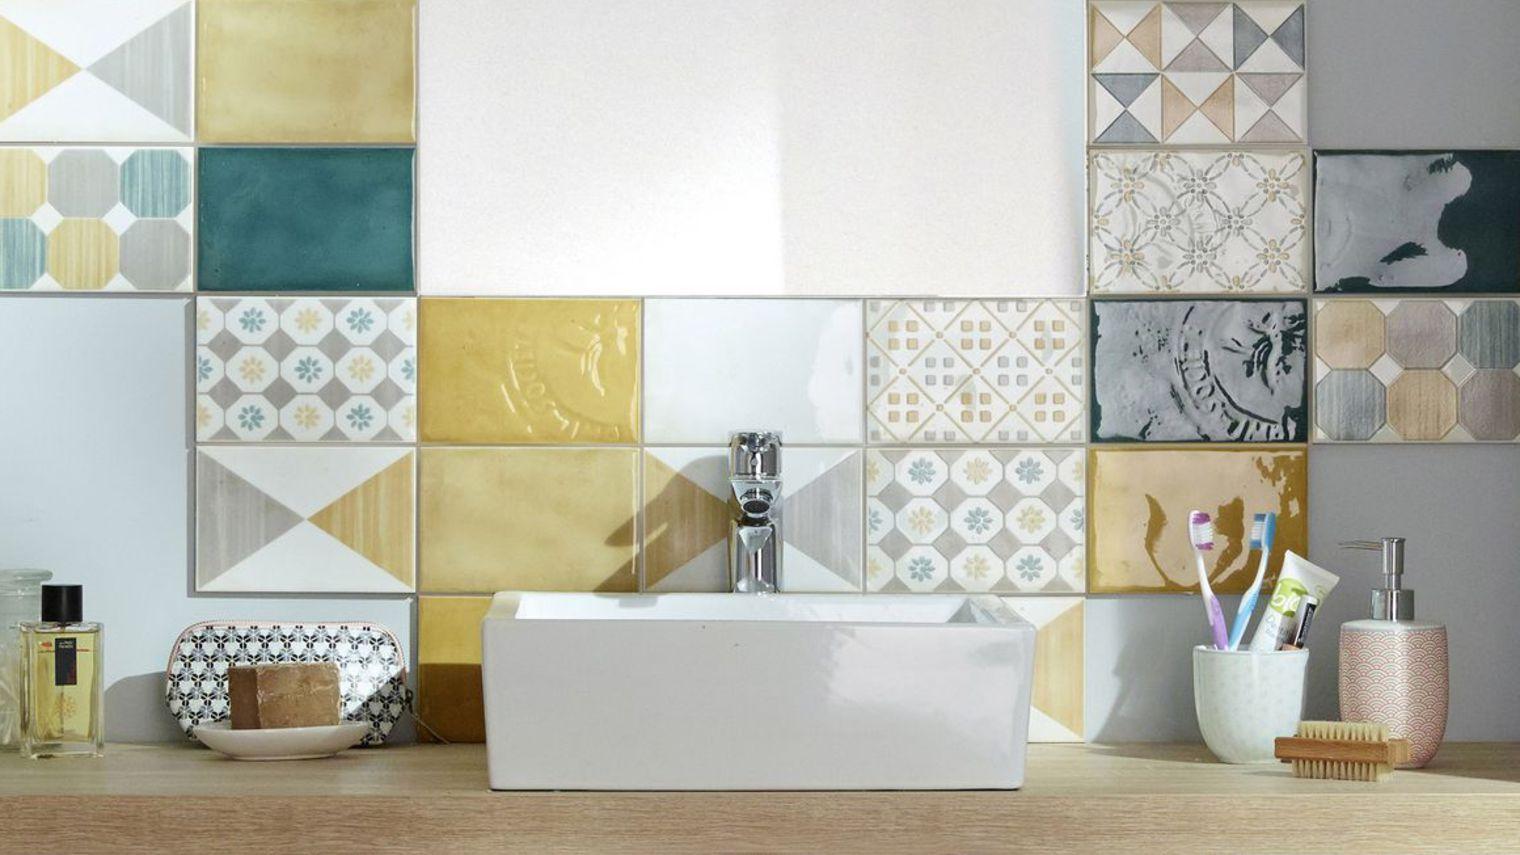 L Gant Kasanga Meuble Miroir Salle De Bain Castorama 8 Mosaique For